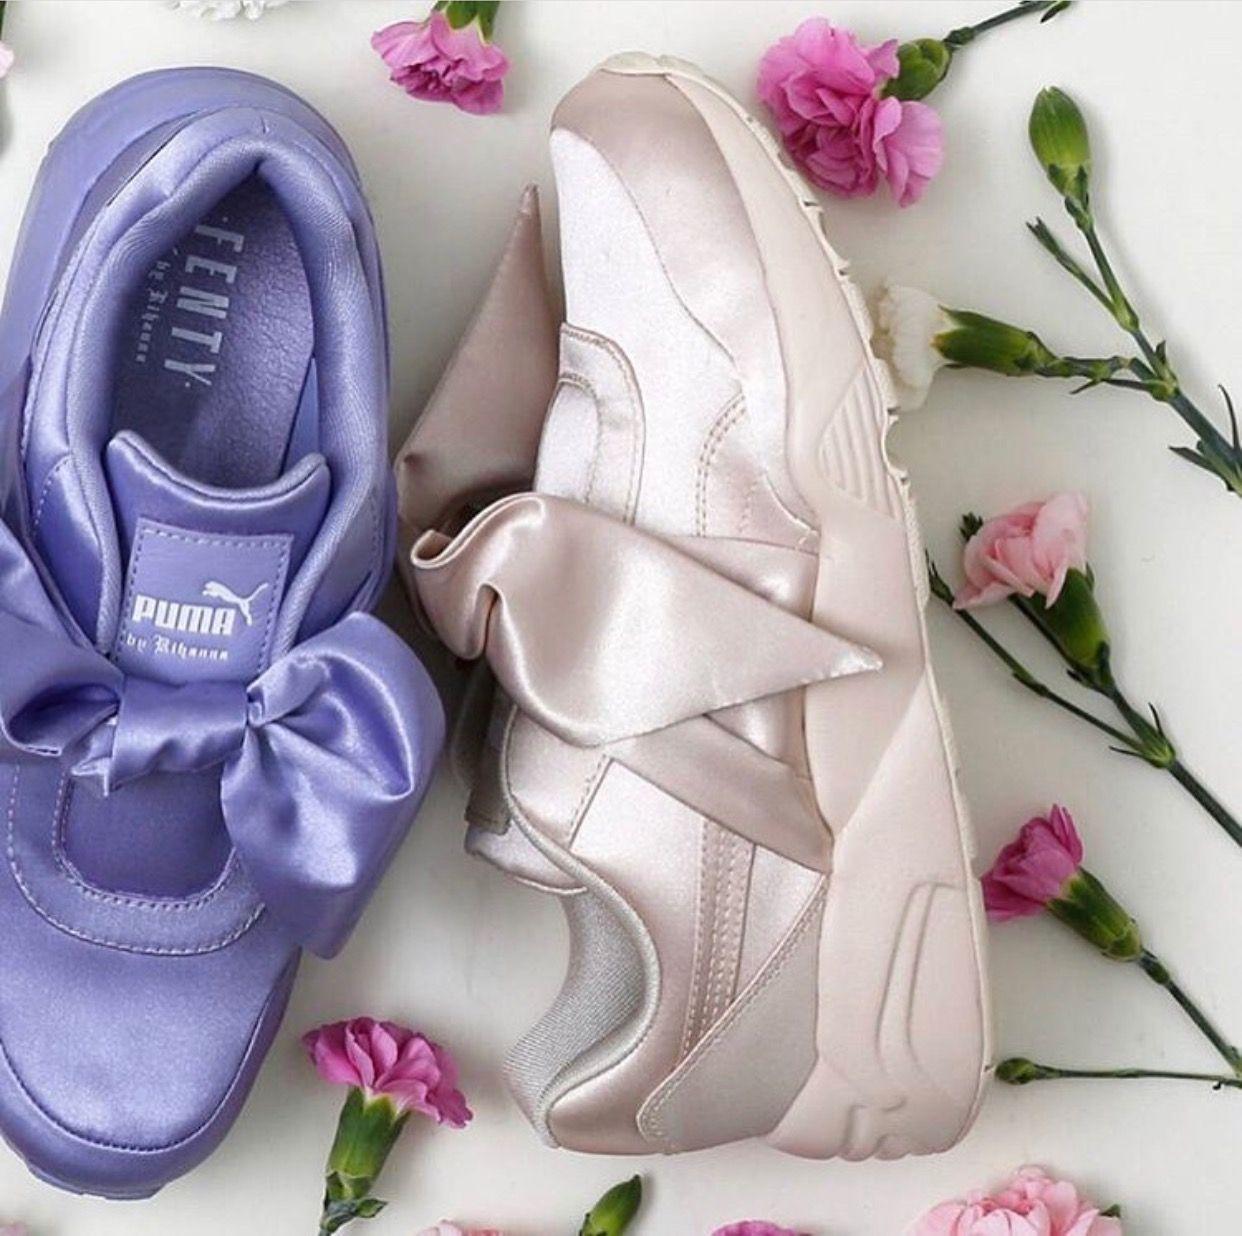 chaussure puma fille avec noeud